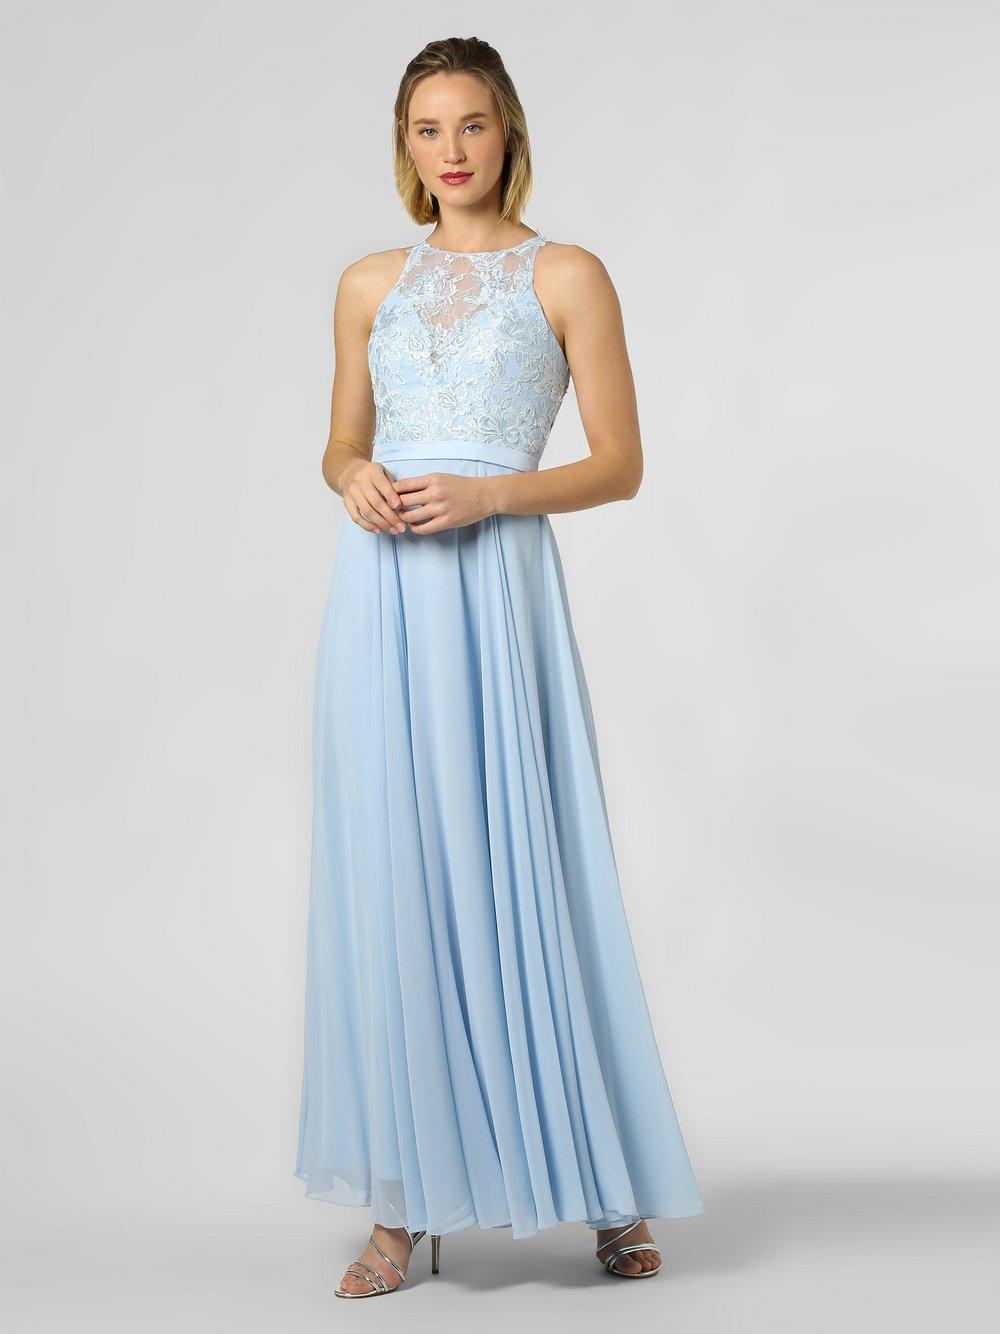 Luxuar Fashion – Damska sukienka wieczorowa, niebieski Van Graaf 457402-0001-00340